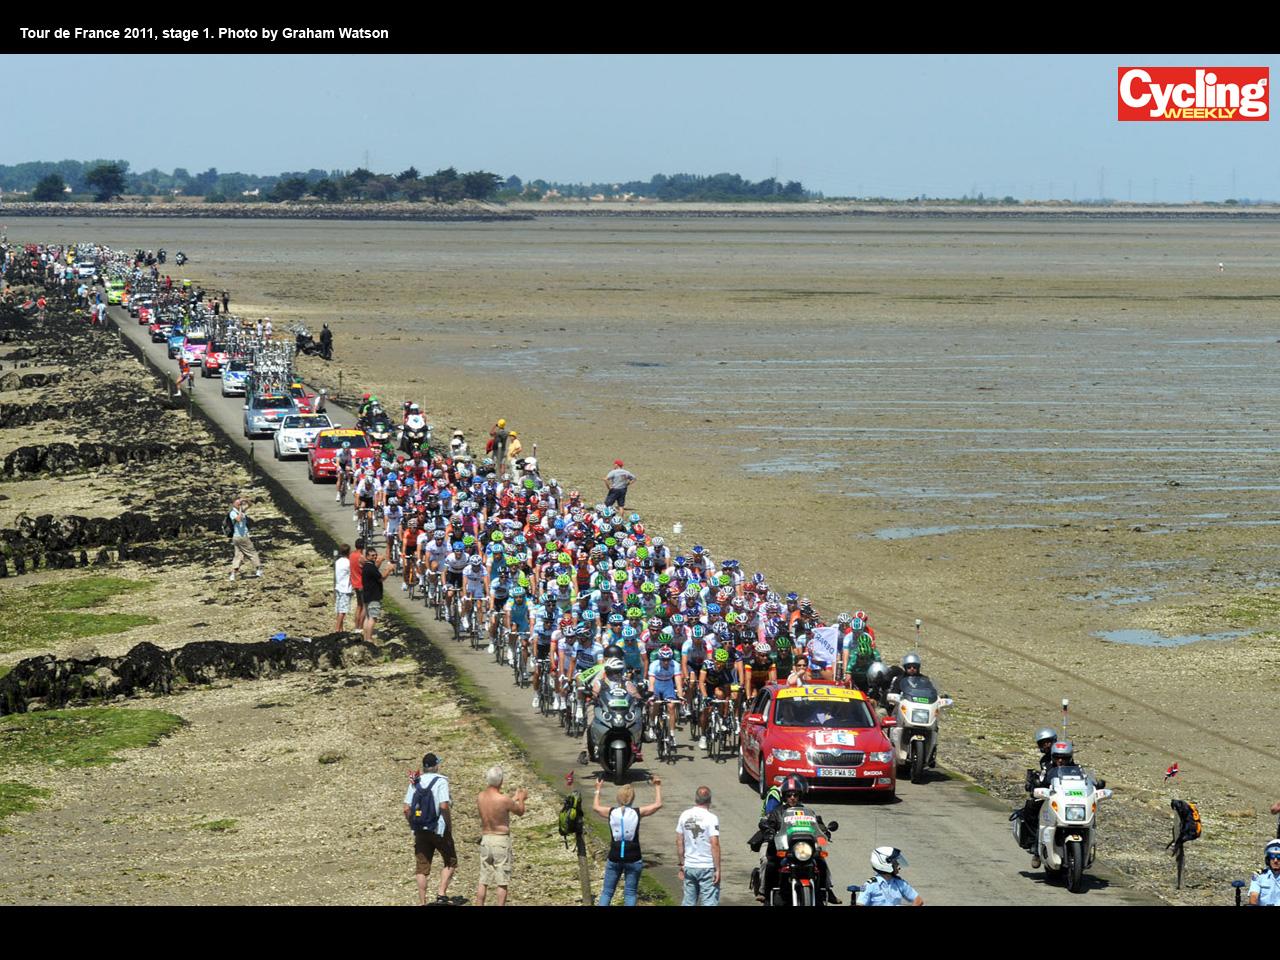 Tour de France 2011 wallpaper   Cycling Weekly 1280x960